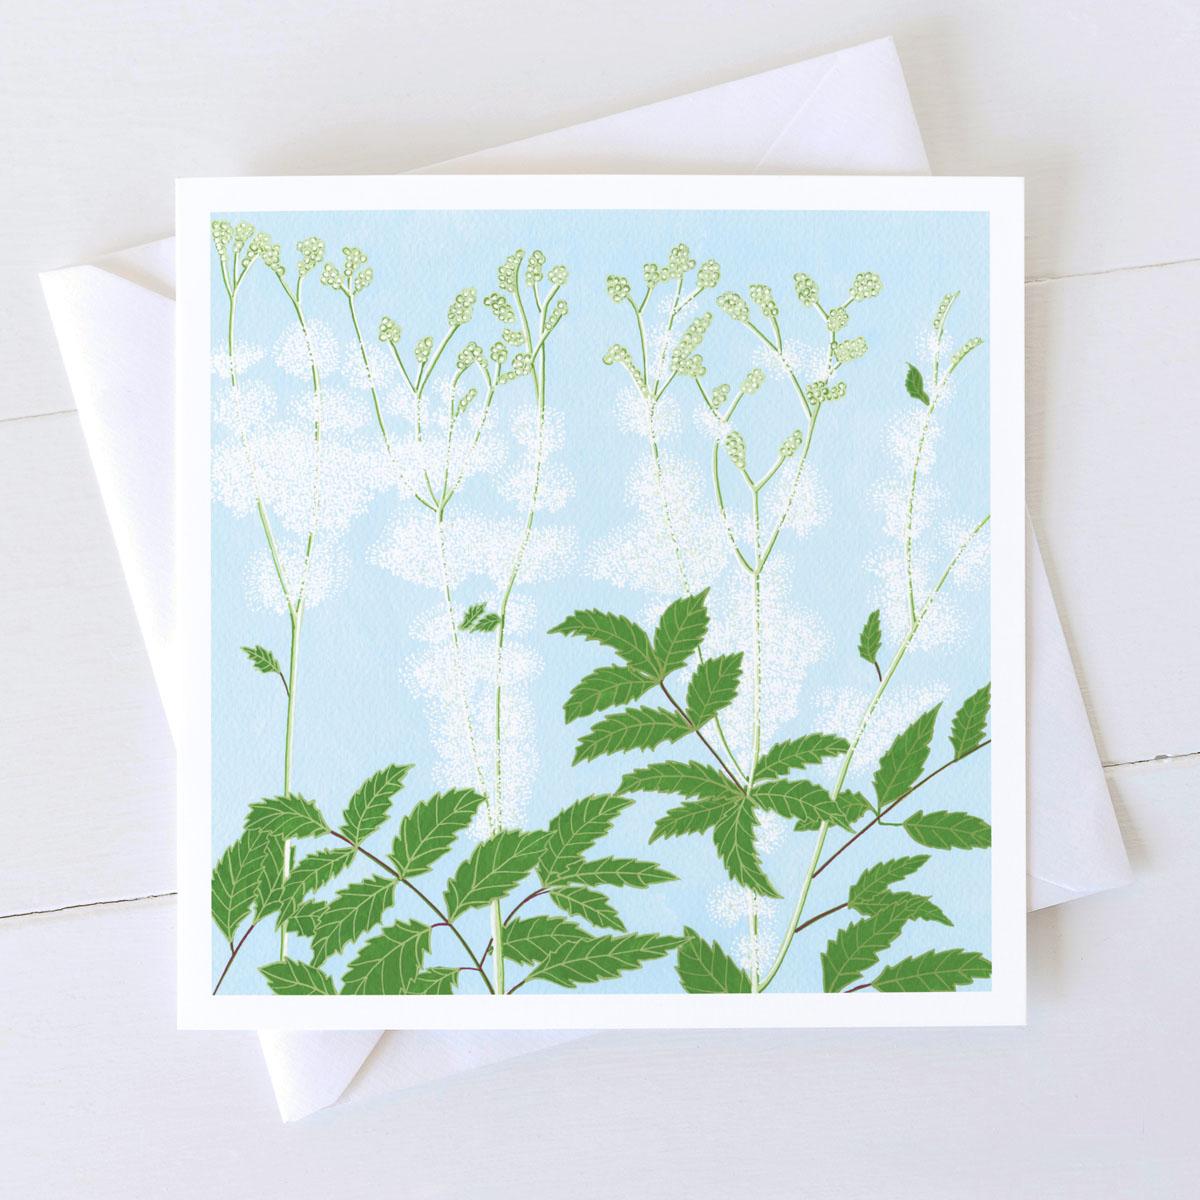 Meadow Sweet Wild Plant Greeting Card